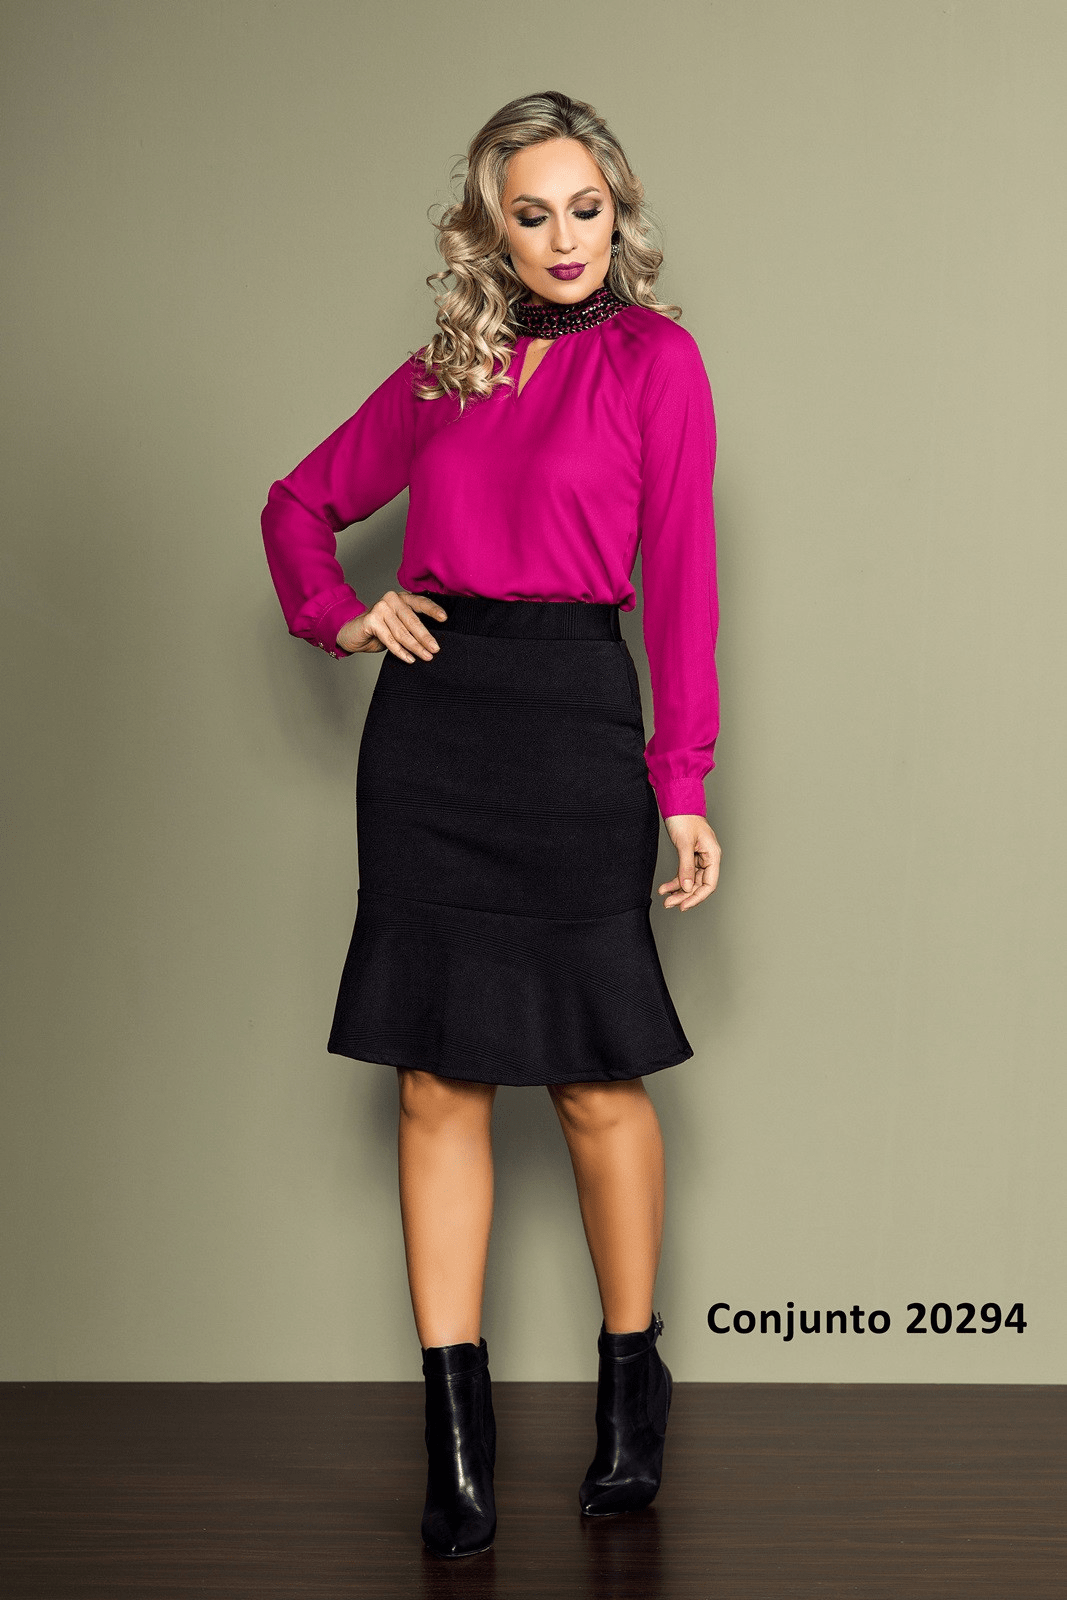 Conjunto Rettroz Gola Bordada 20294